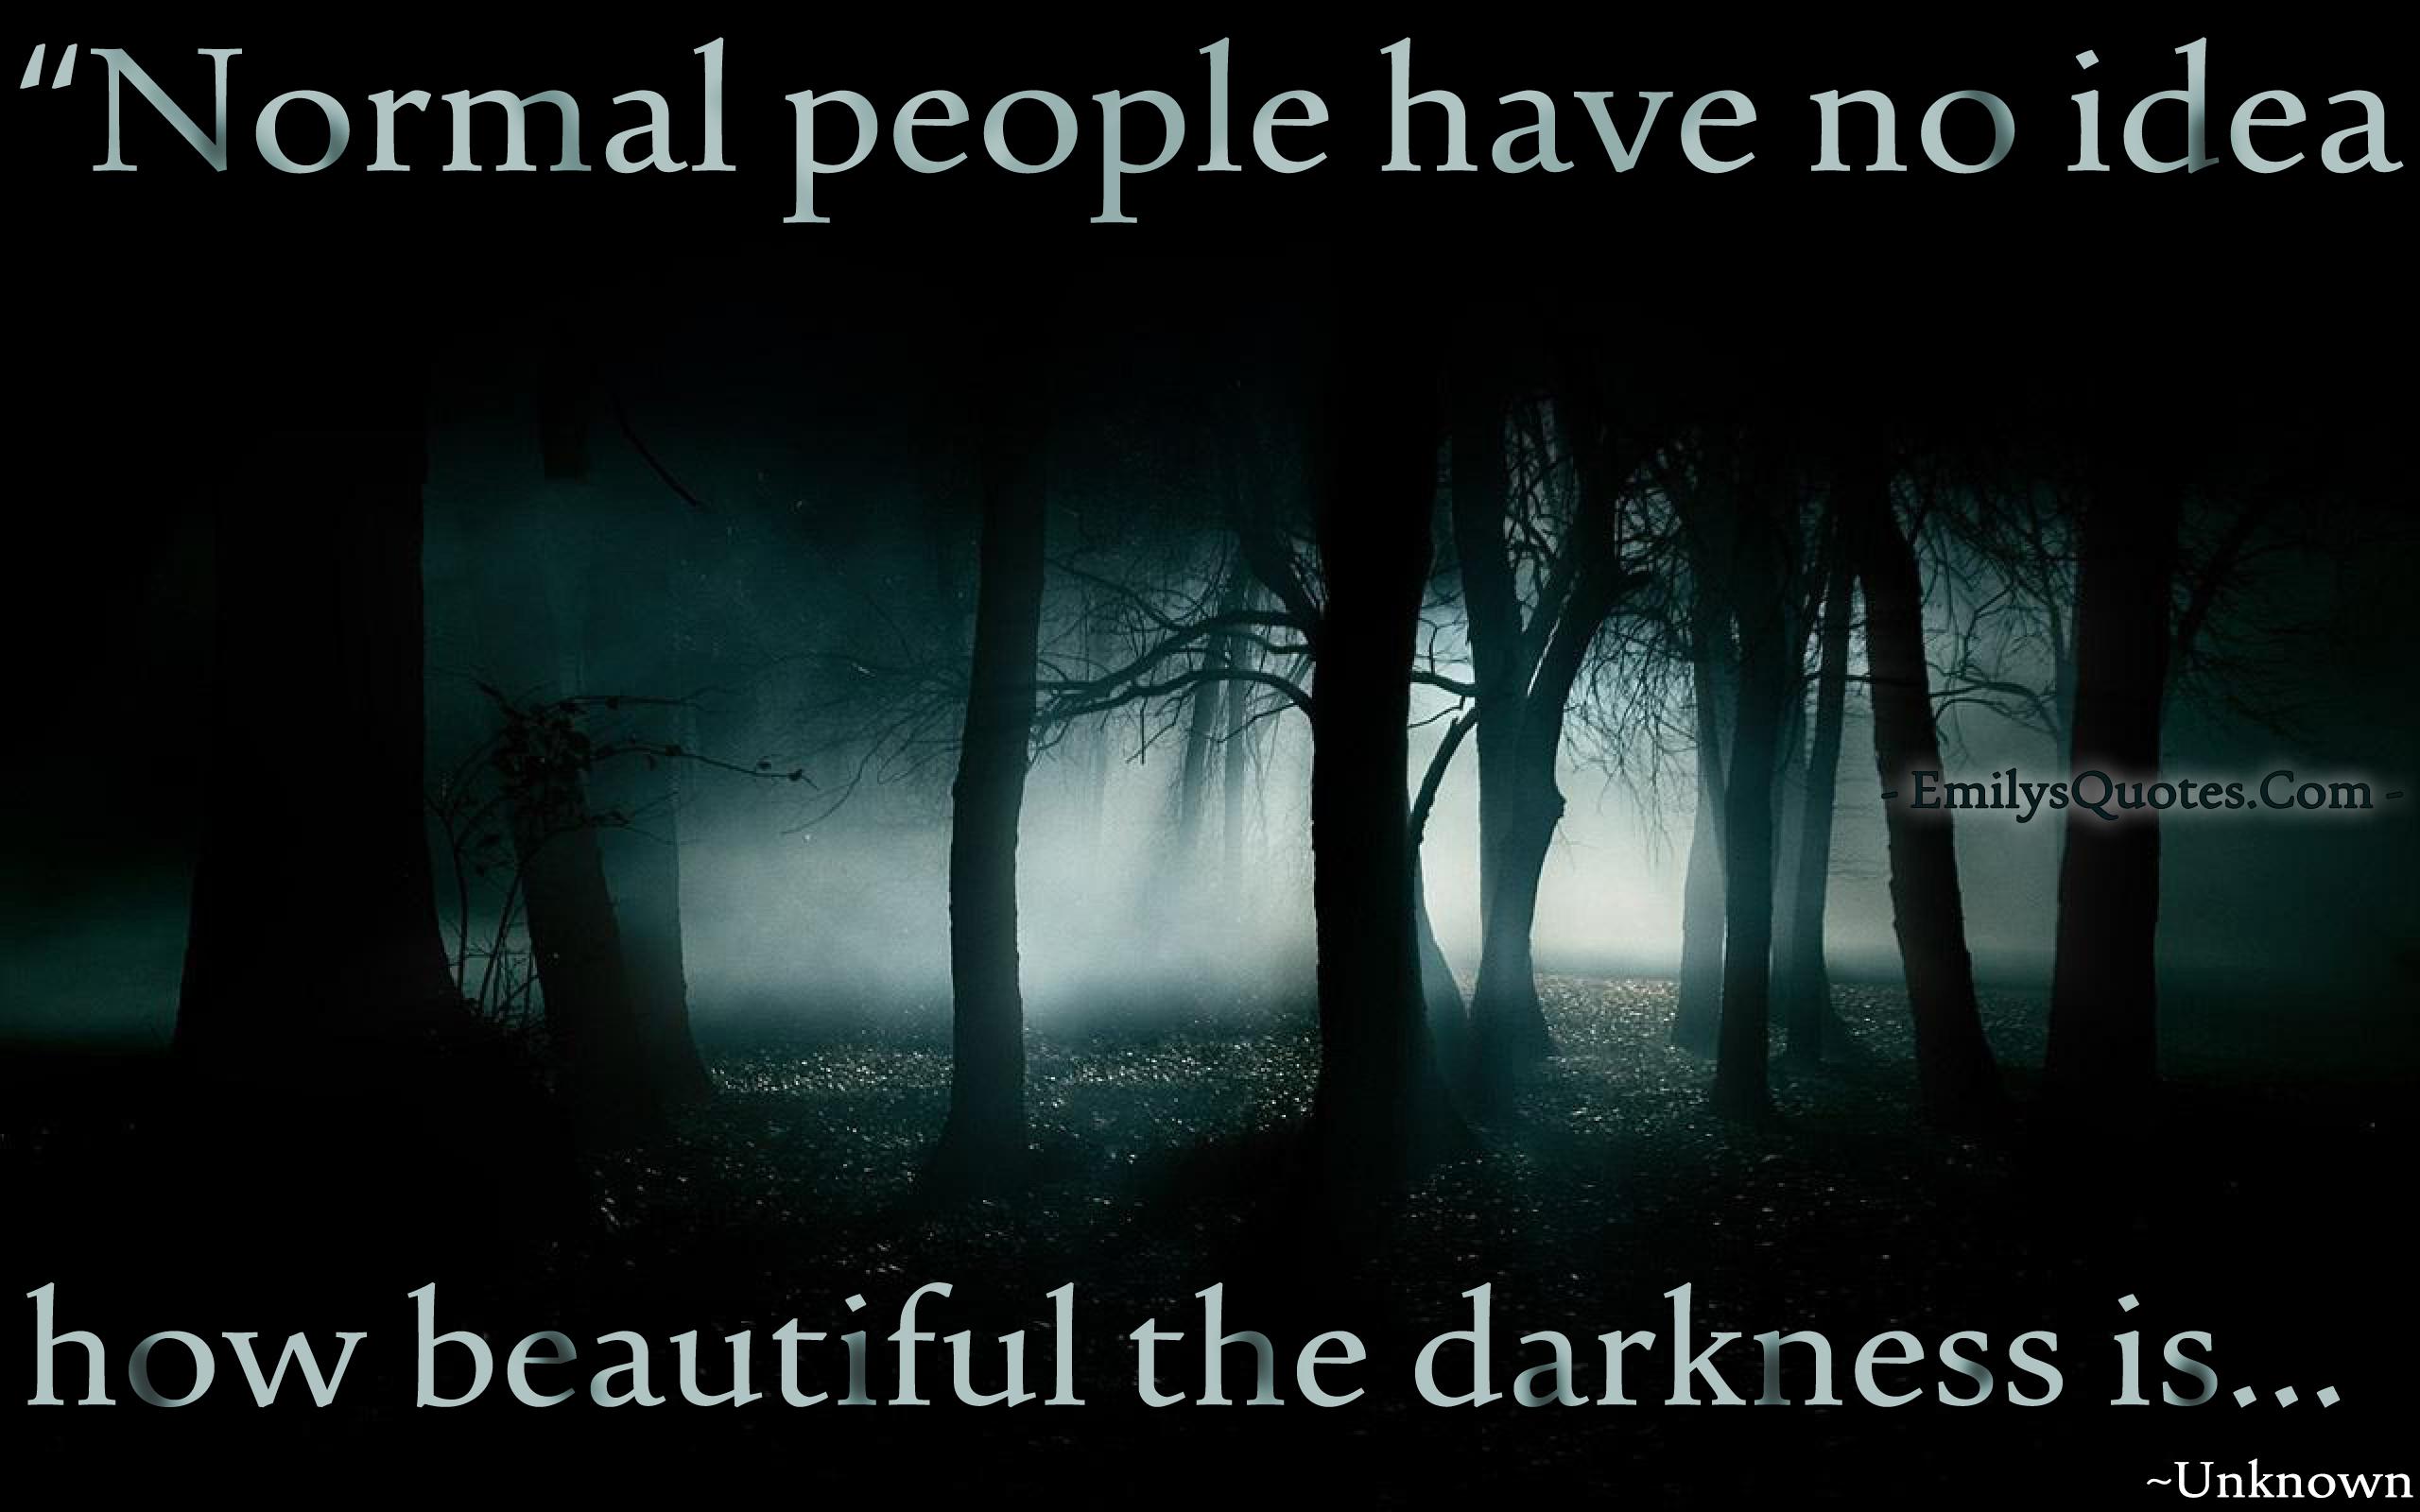 EmilysQuotes.Com - people, understanding, darkness, unknown, negative